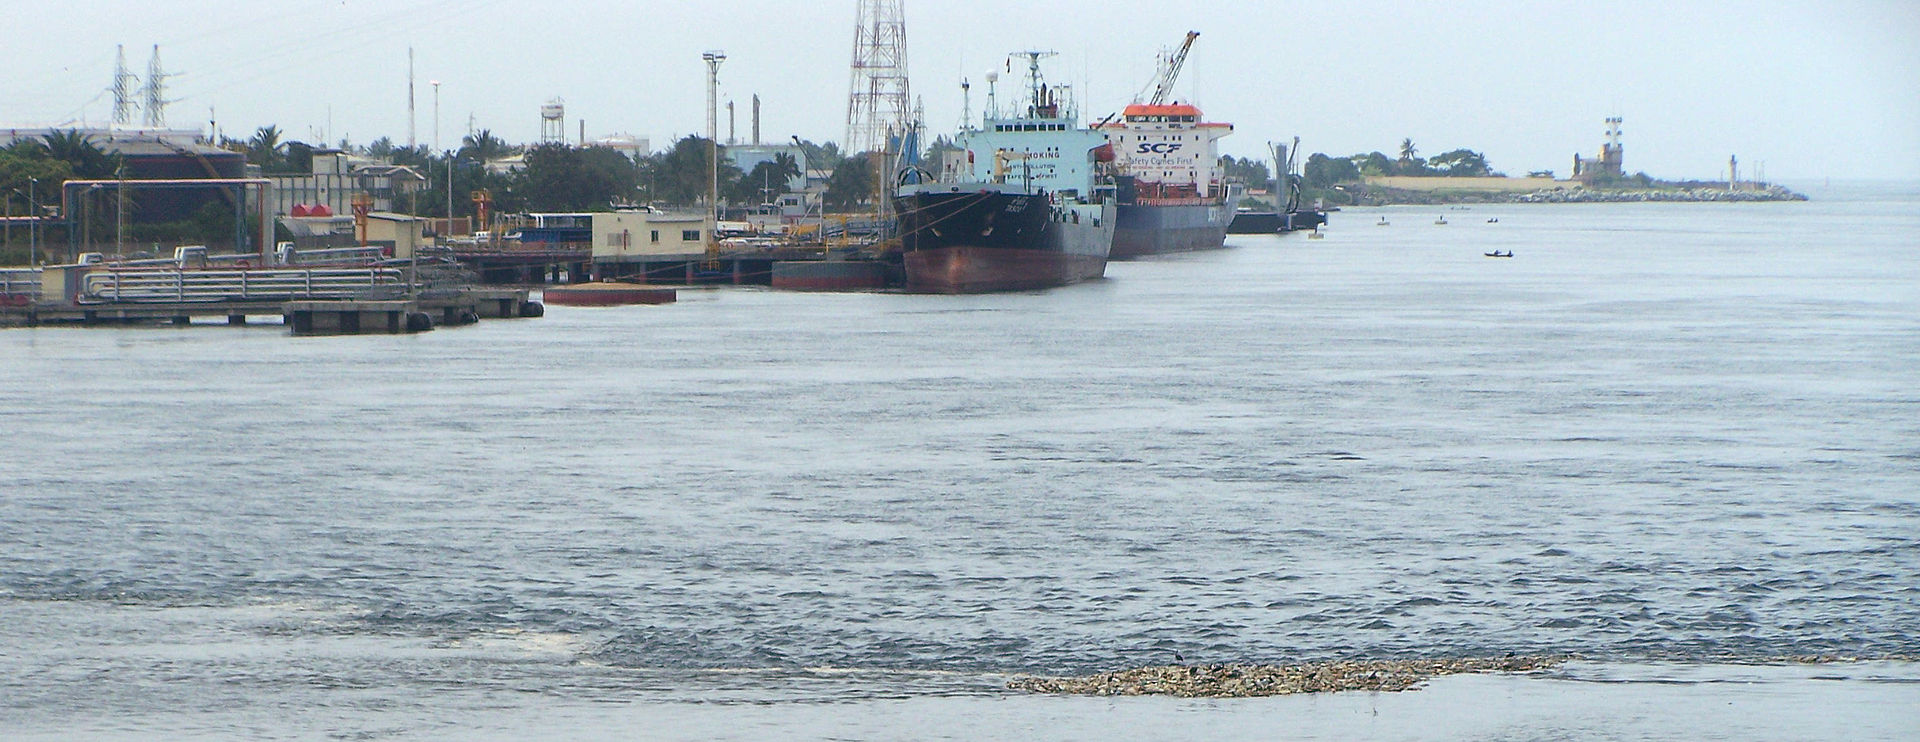 2009 Abidjan port 3842716900.jpg